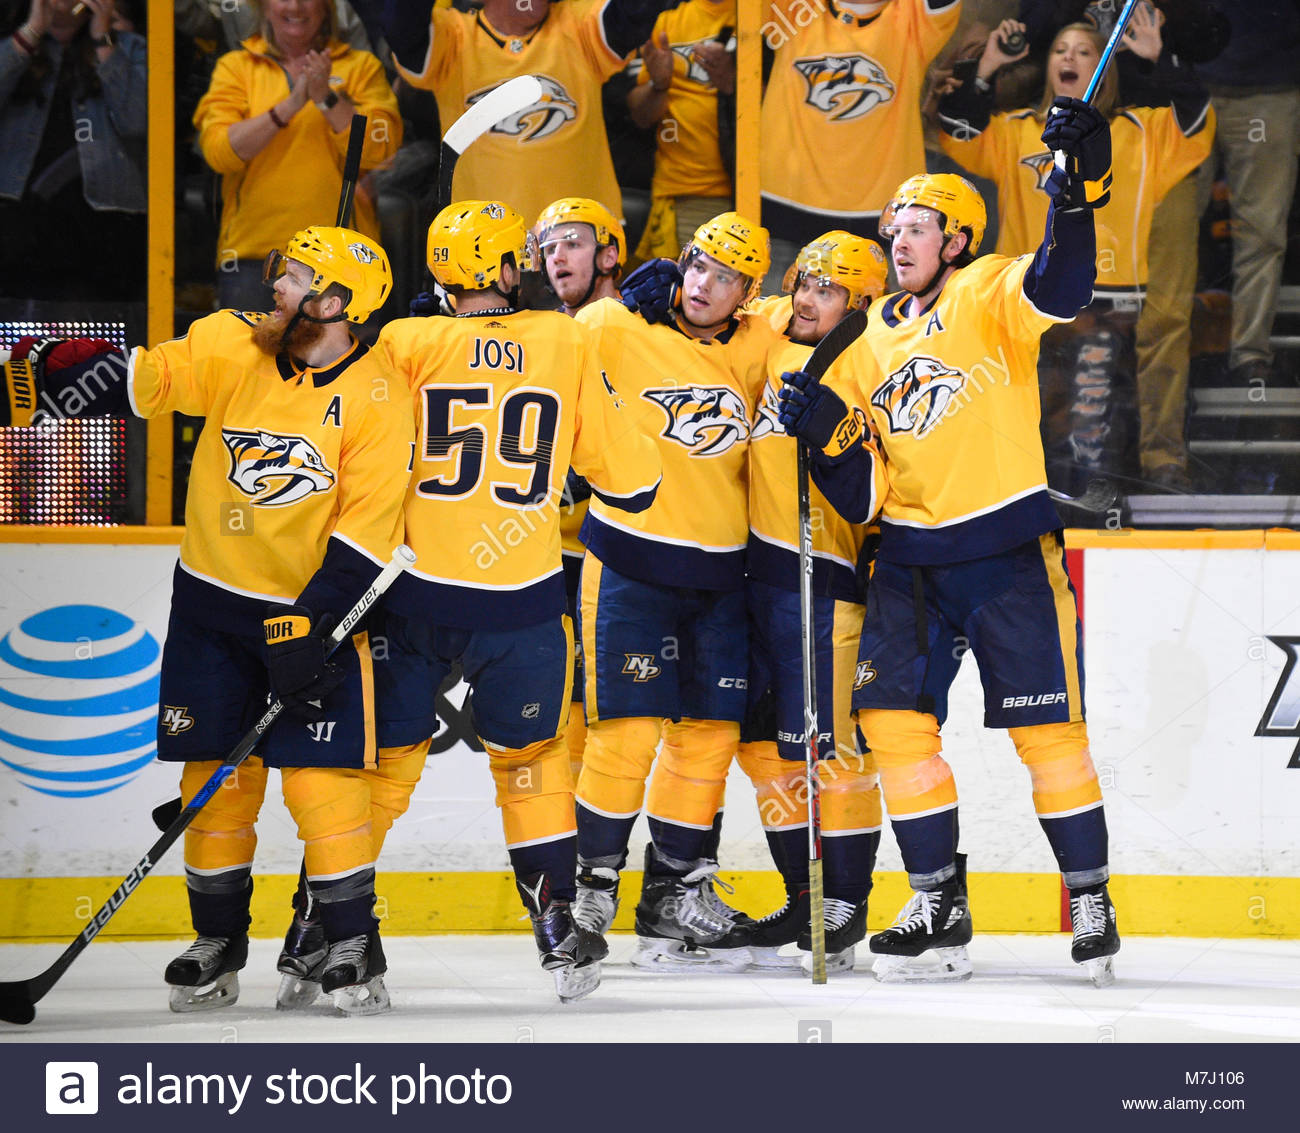 Bridgestone Arena. 10th Mar, 2018. USA Nashville Predators center Ryan Johansen (92) and his teammates celebrate - Stock Image